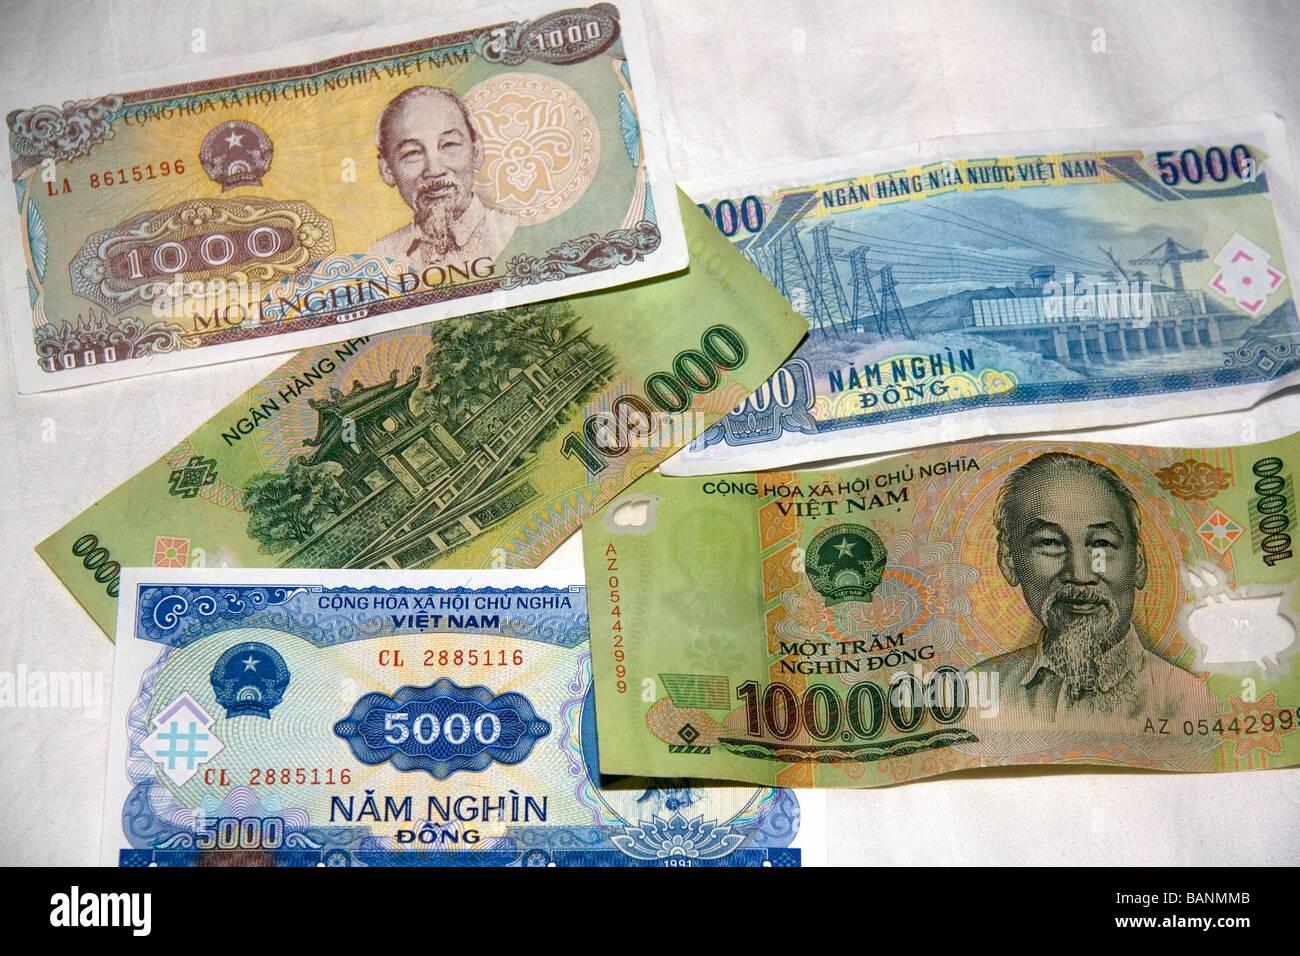 Vietnam Dong Money Stock Photos & Vietnam Dong Money Stock